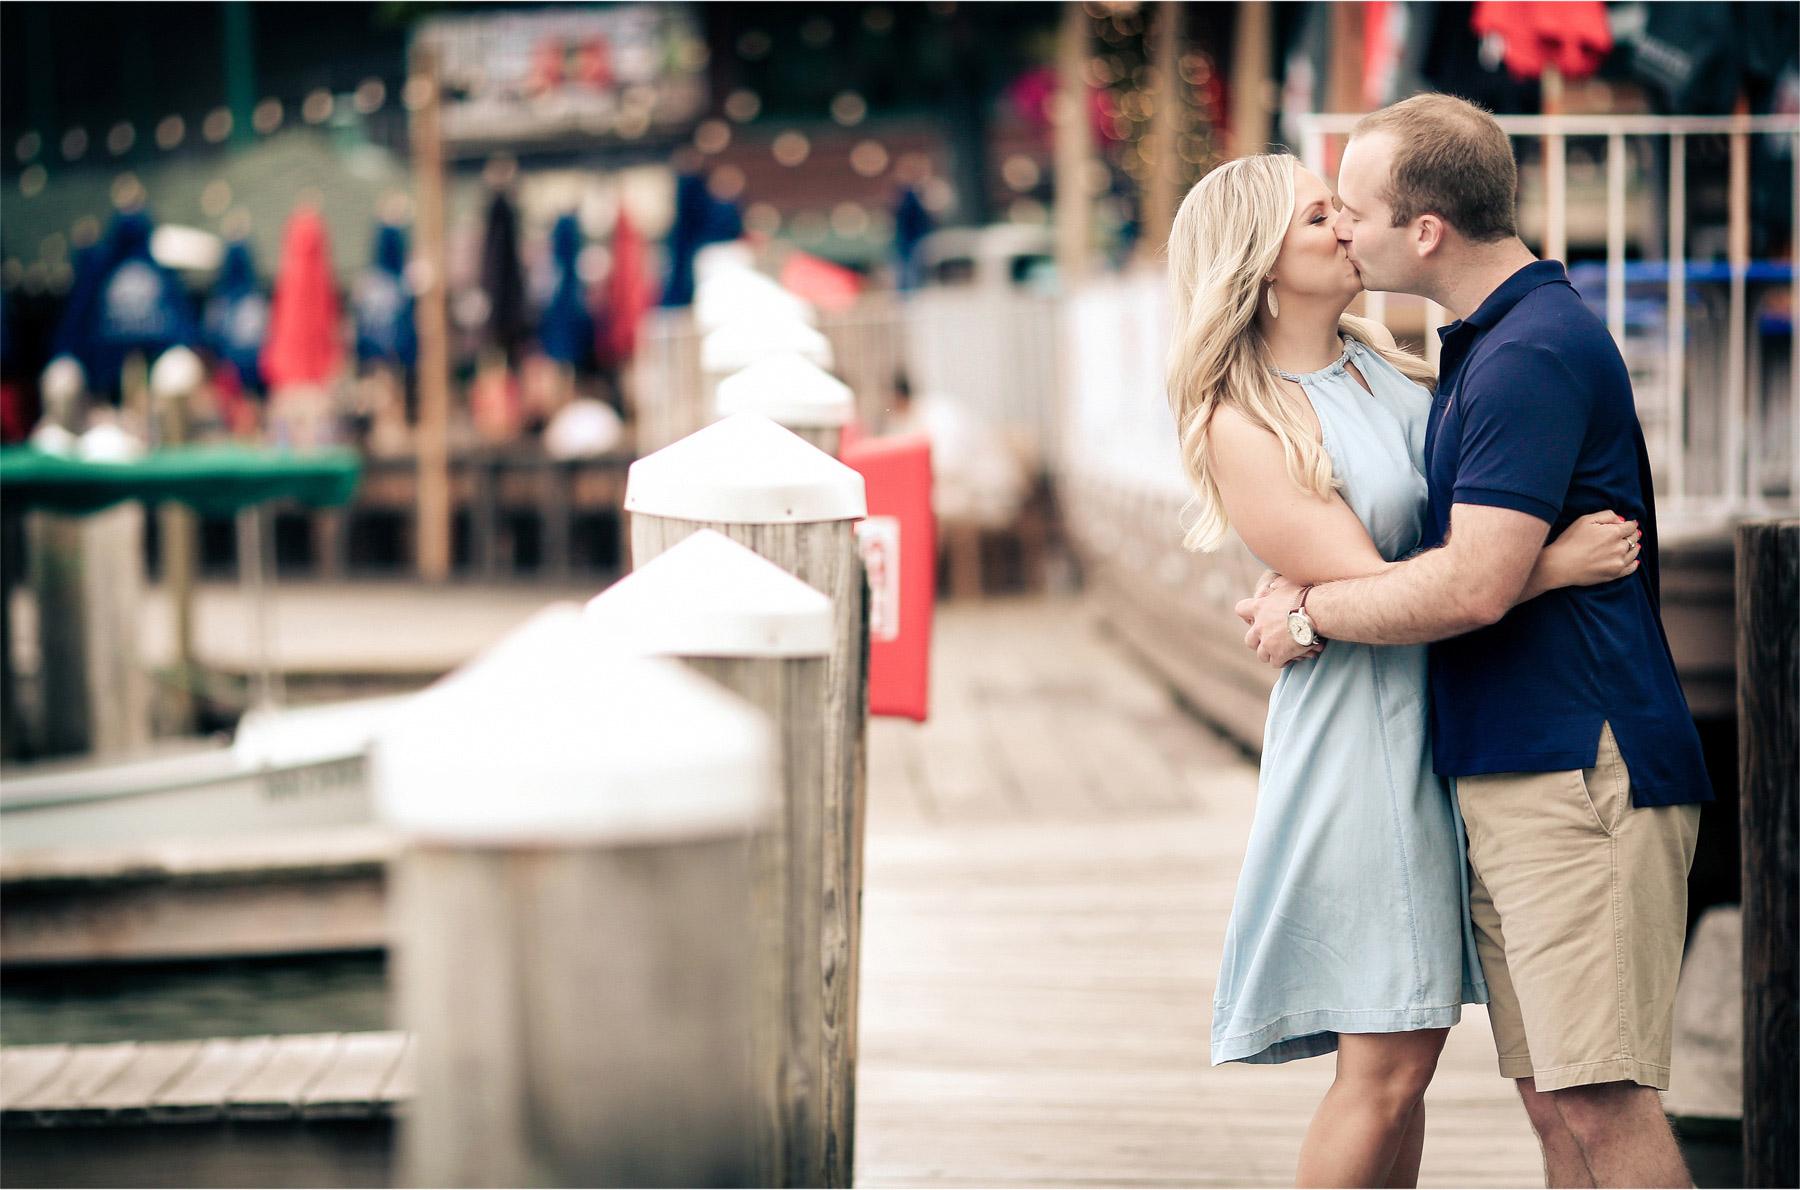 02-Wayzata-Minnesota-Engagement-Photographer-by-Andrew-Vick-Photography-Summer-Lake-Minnetonka-Kiss-Dock-Vintage-Ashley-&-Kasey.jpg